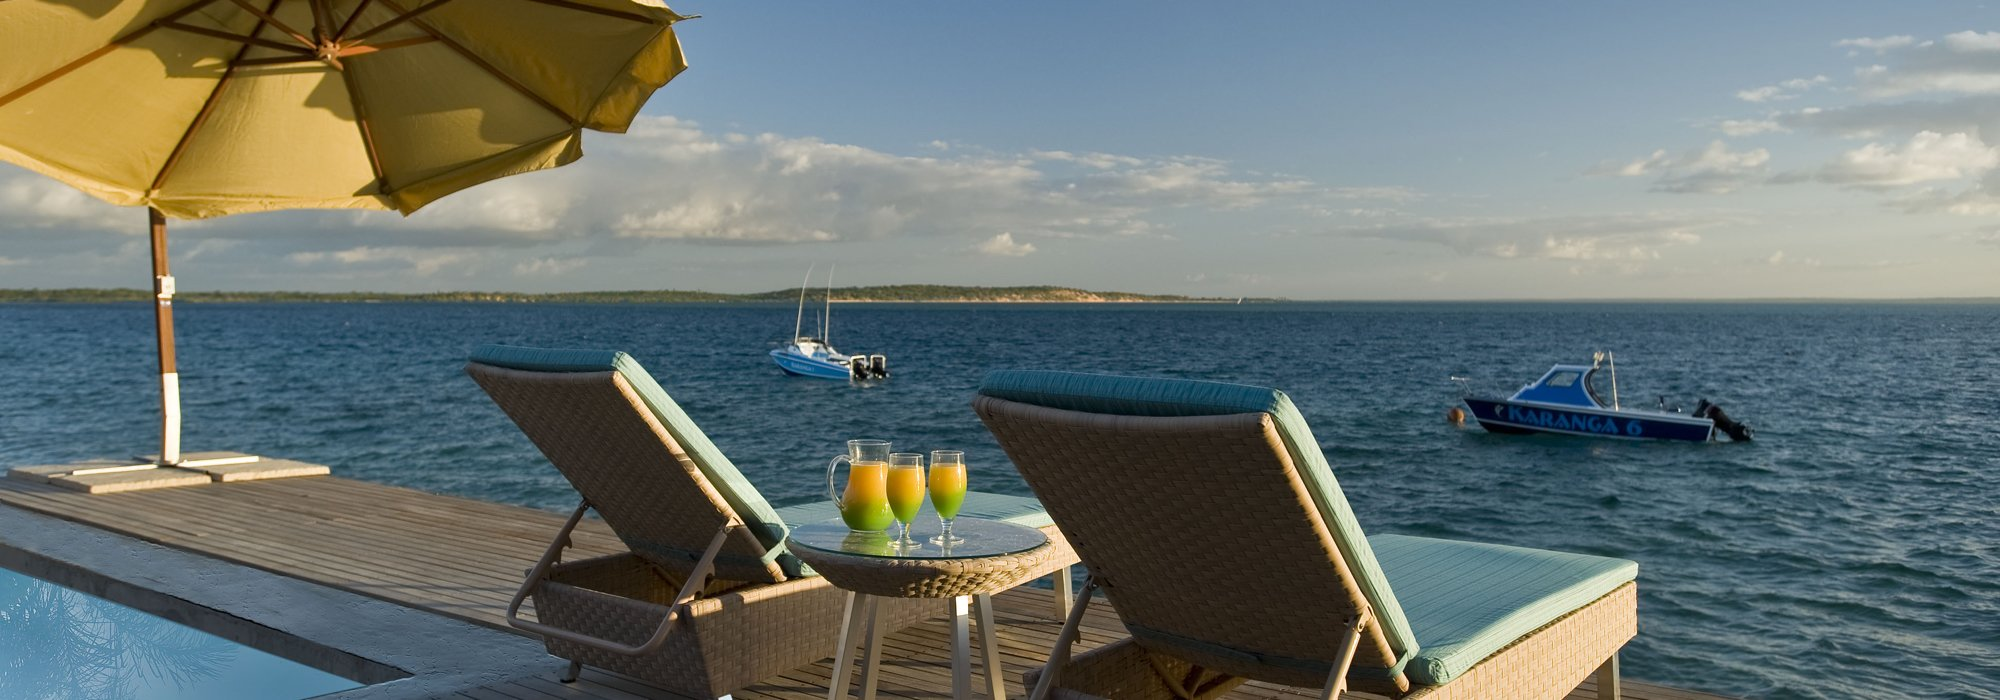 Dugong Beach Lodge Sea View in Mozambique